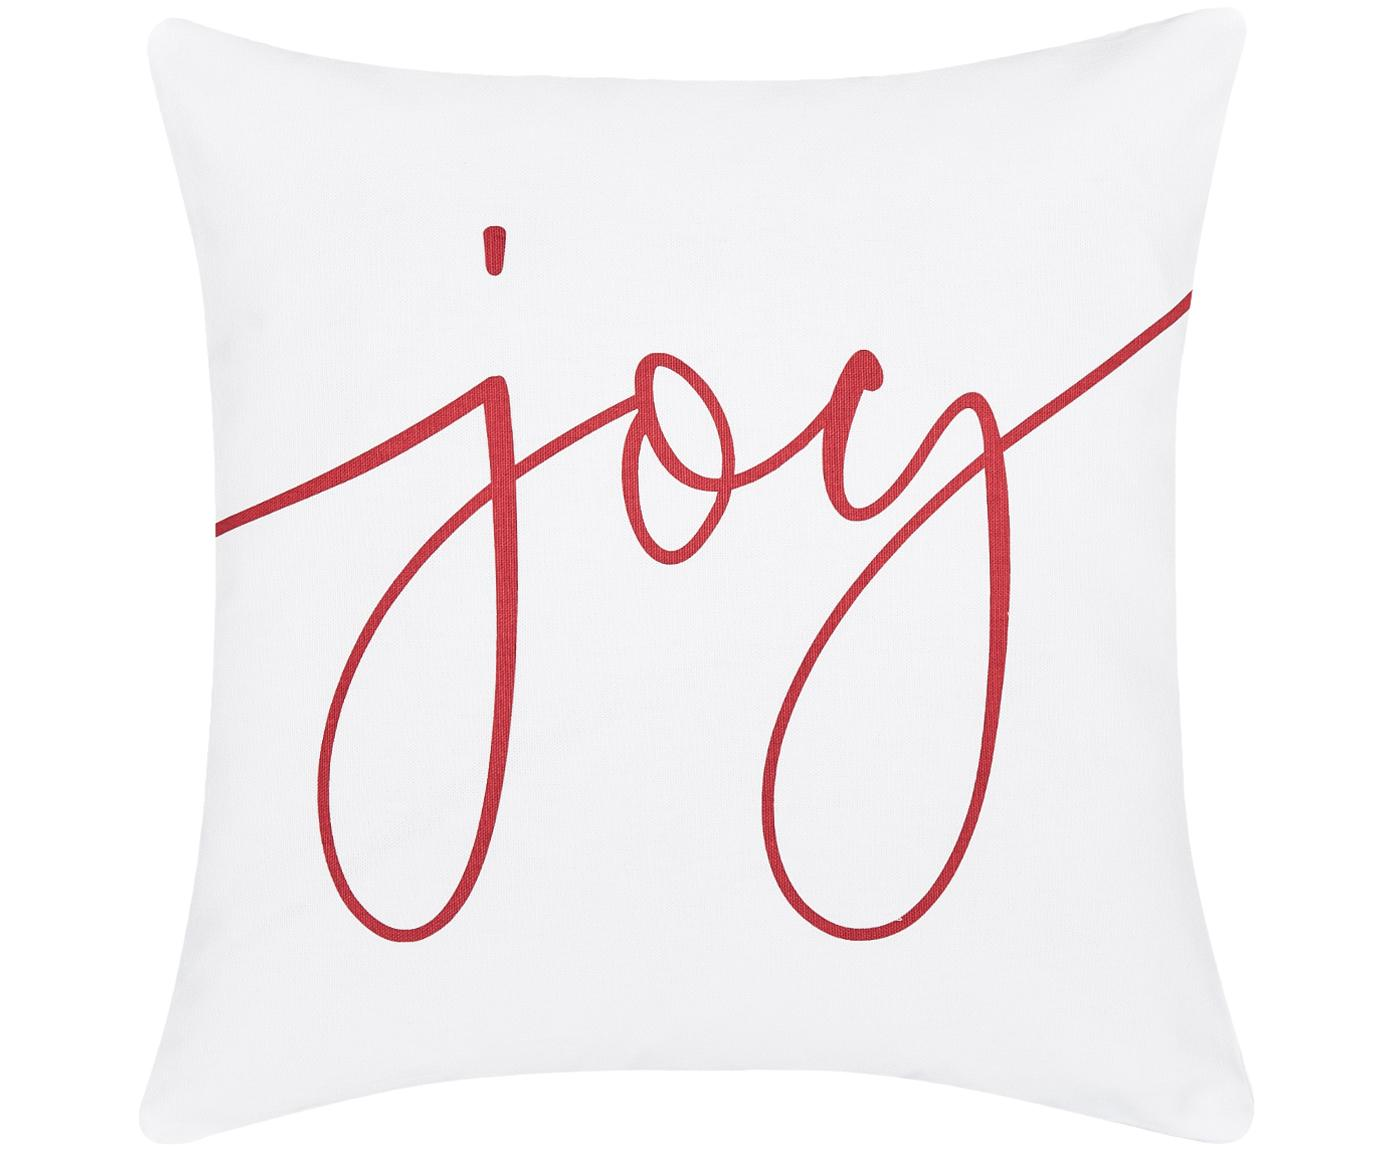 Kussenhoes Joy, Katoen, Wit, rood, 40 x 40 cm